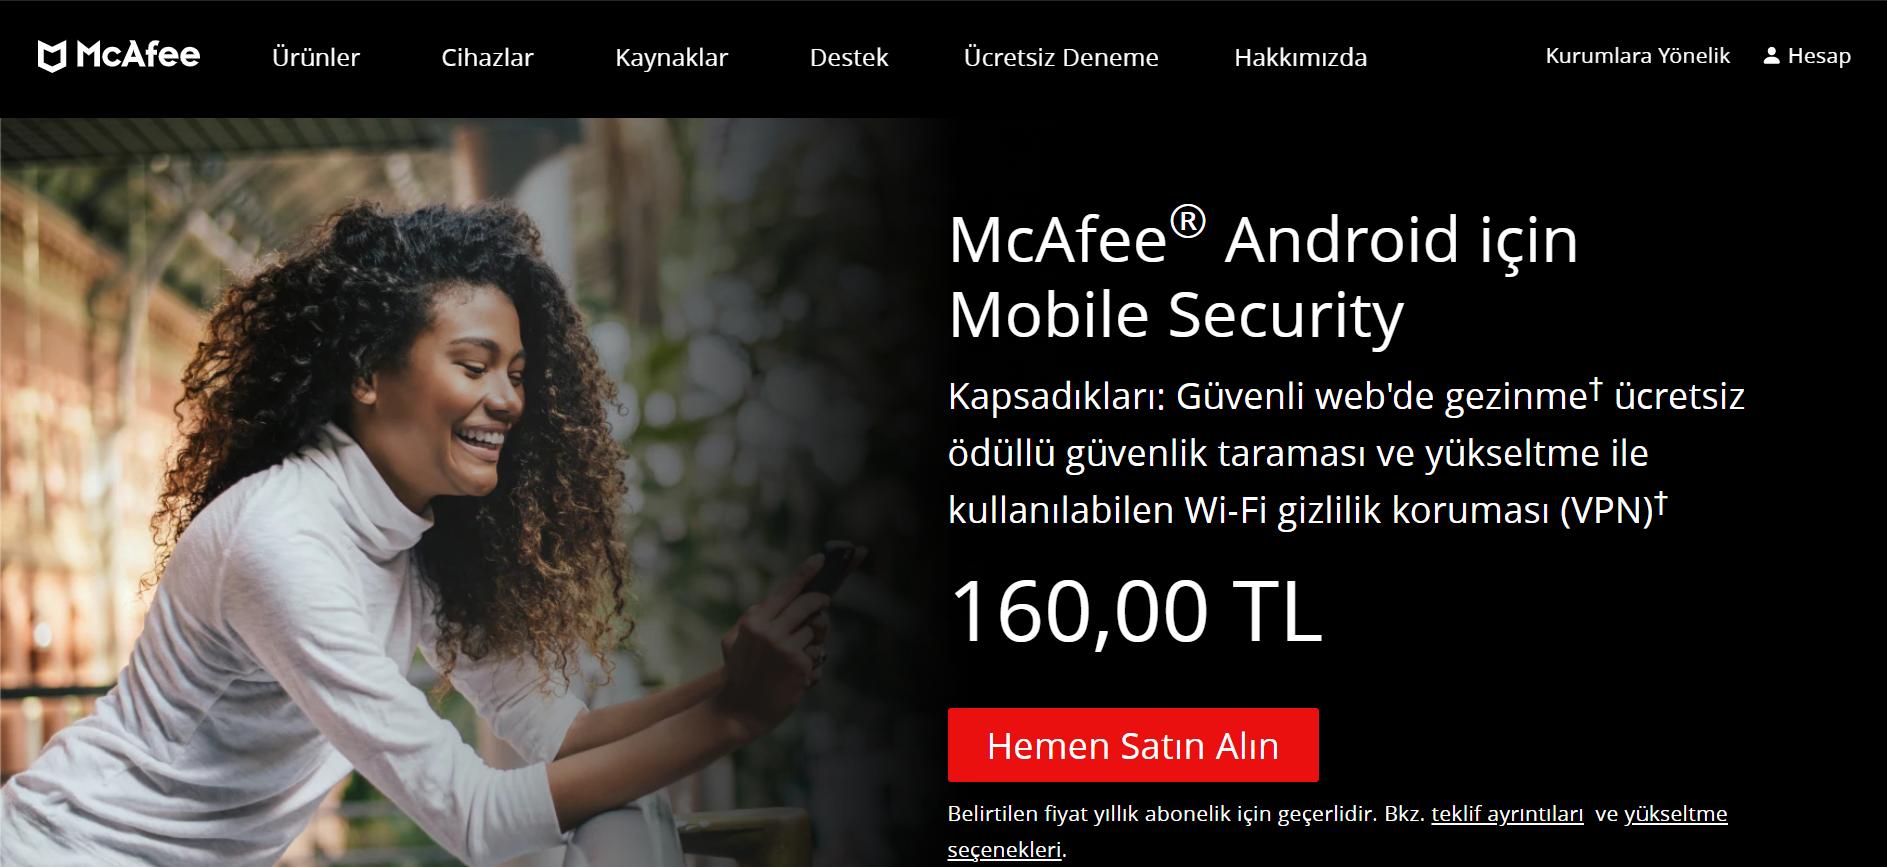 McAfee web sayfası